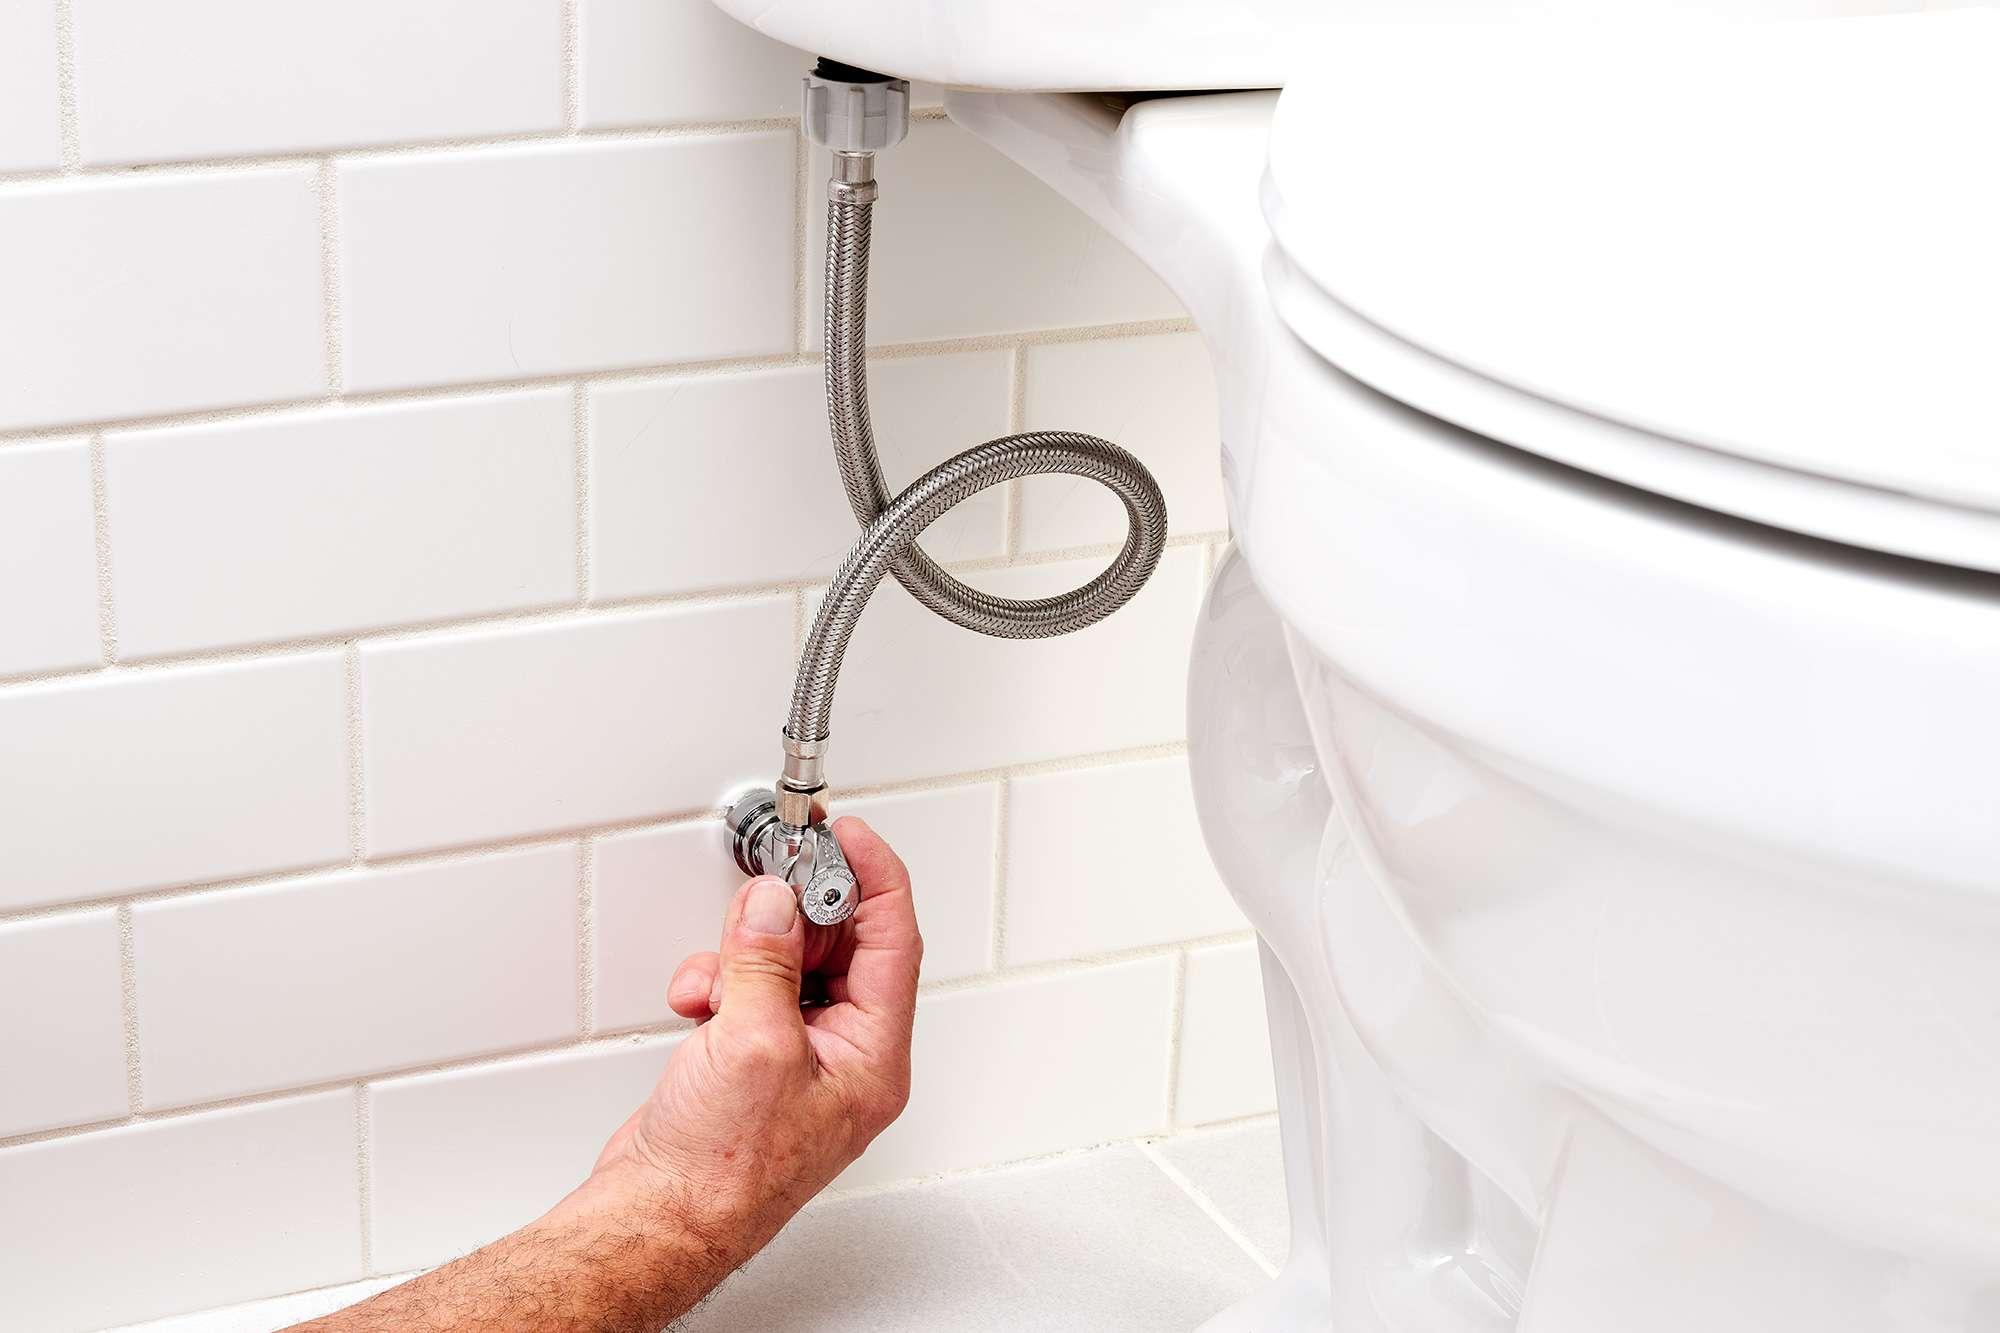 Water shut off by turning the shutoff valve under the toilet